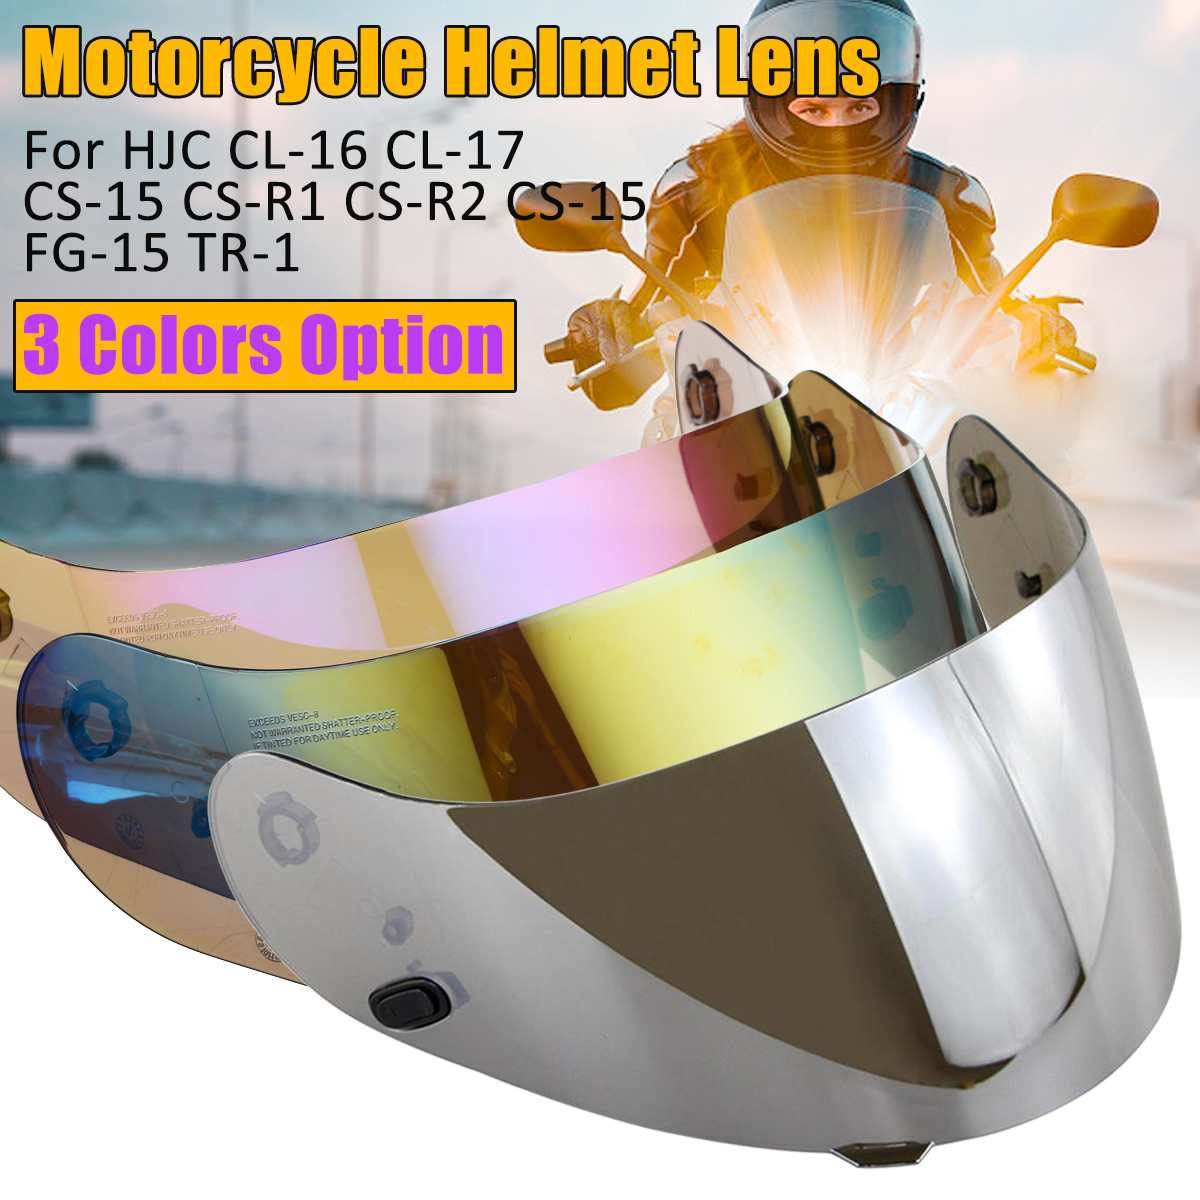 Motorcycle Accessories & Parts Motorcycle Helmet Visor For Hjc Cl-16 Cl-17 Cs-15 Cs-r1 Cs-r2 Cs-15 Fg-15 Tr-1 Shield Parts Original Glasses Motorbike Lens Modern And Elegant In Fashion